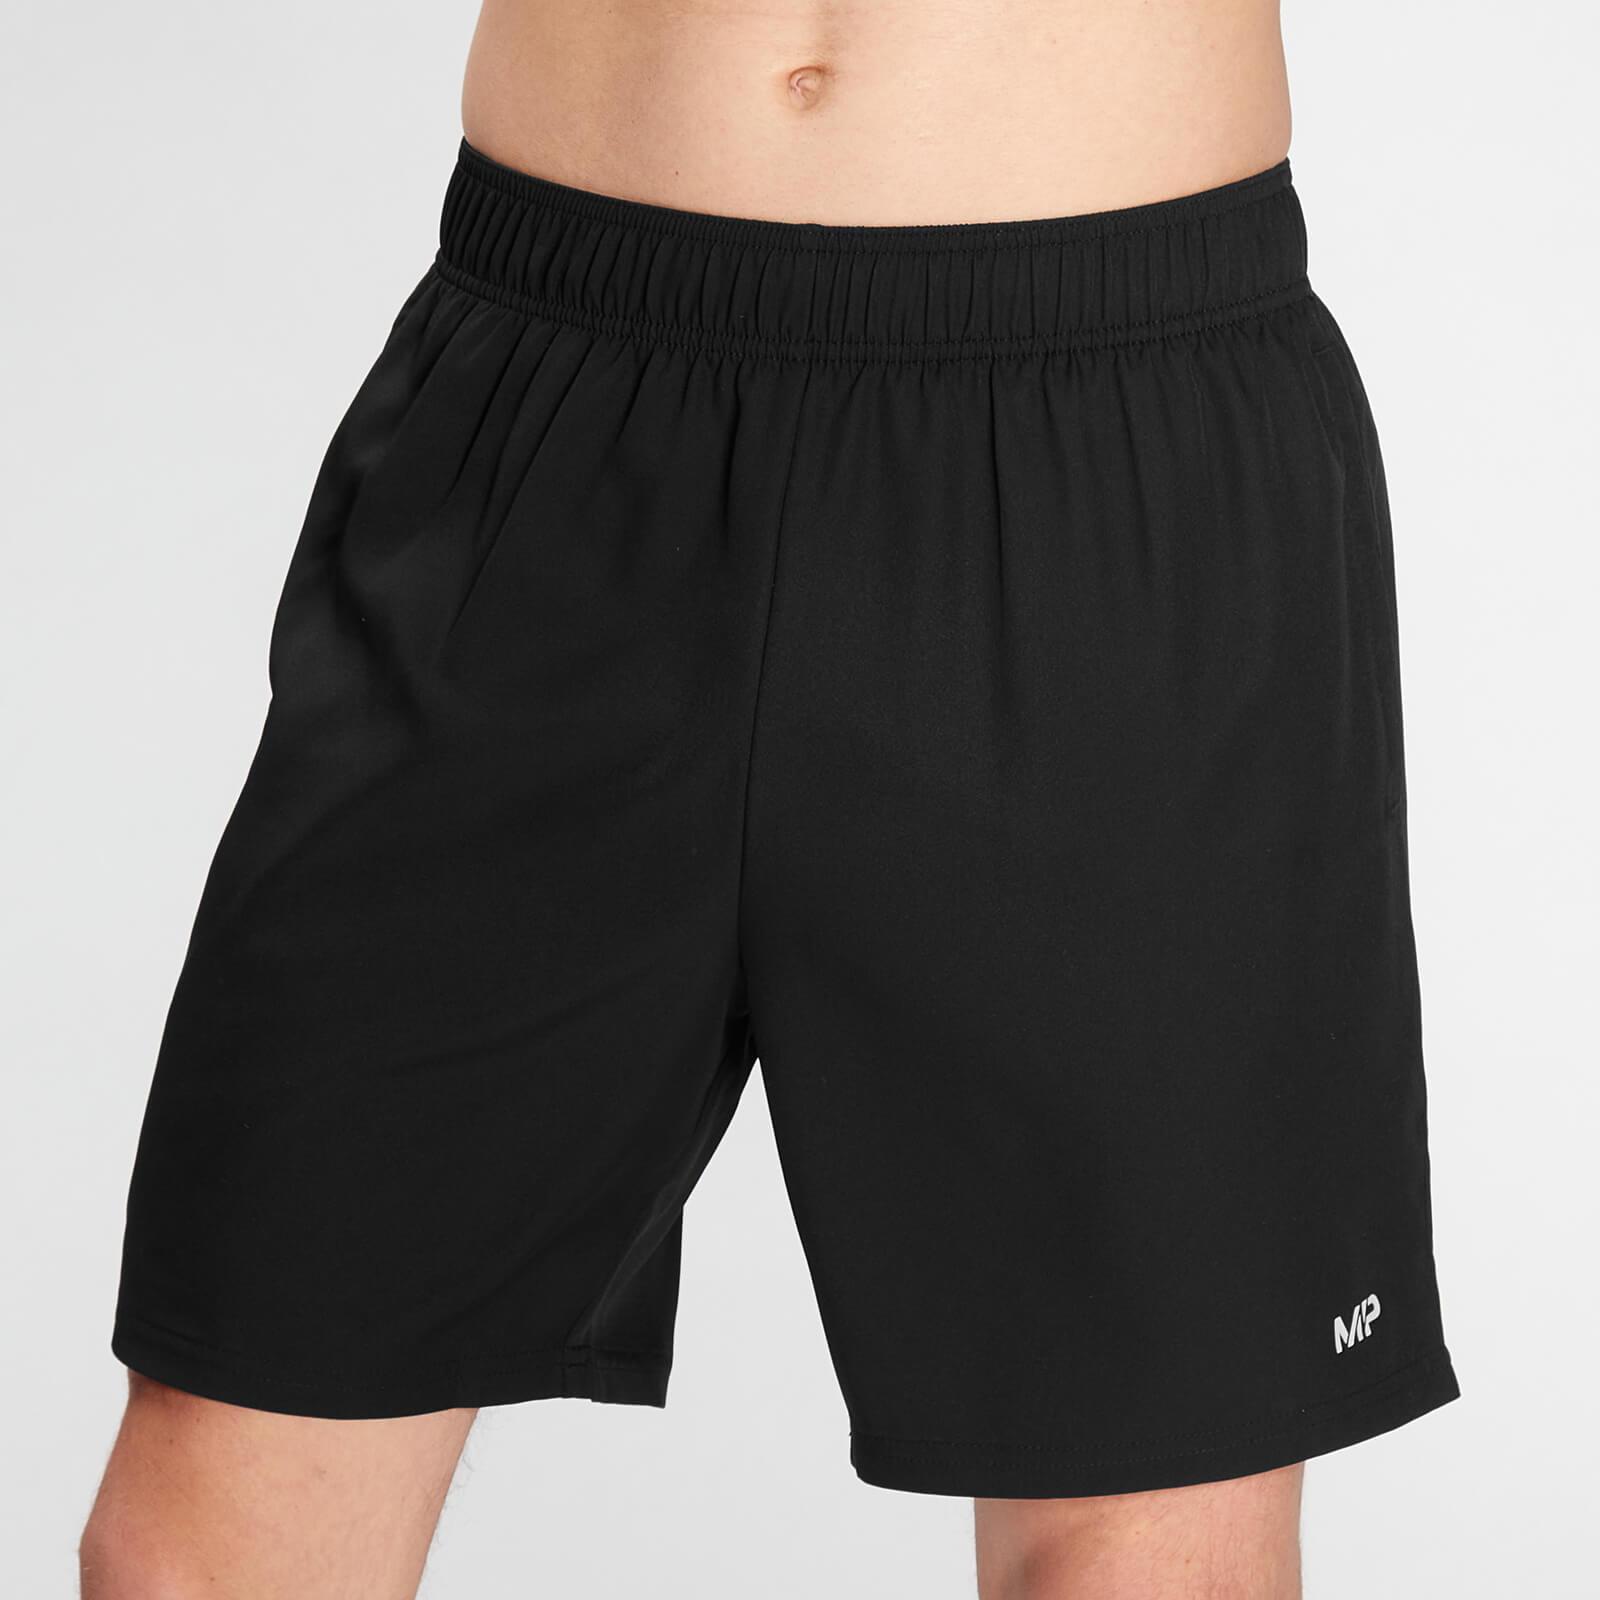 Купить MP Men's Limited Edition Impact Shorts - Black - XXL, Myprotein International